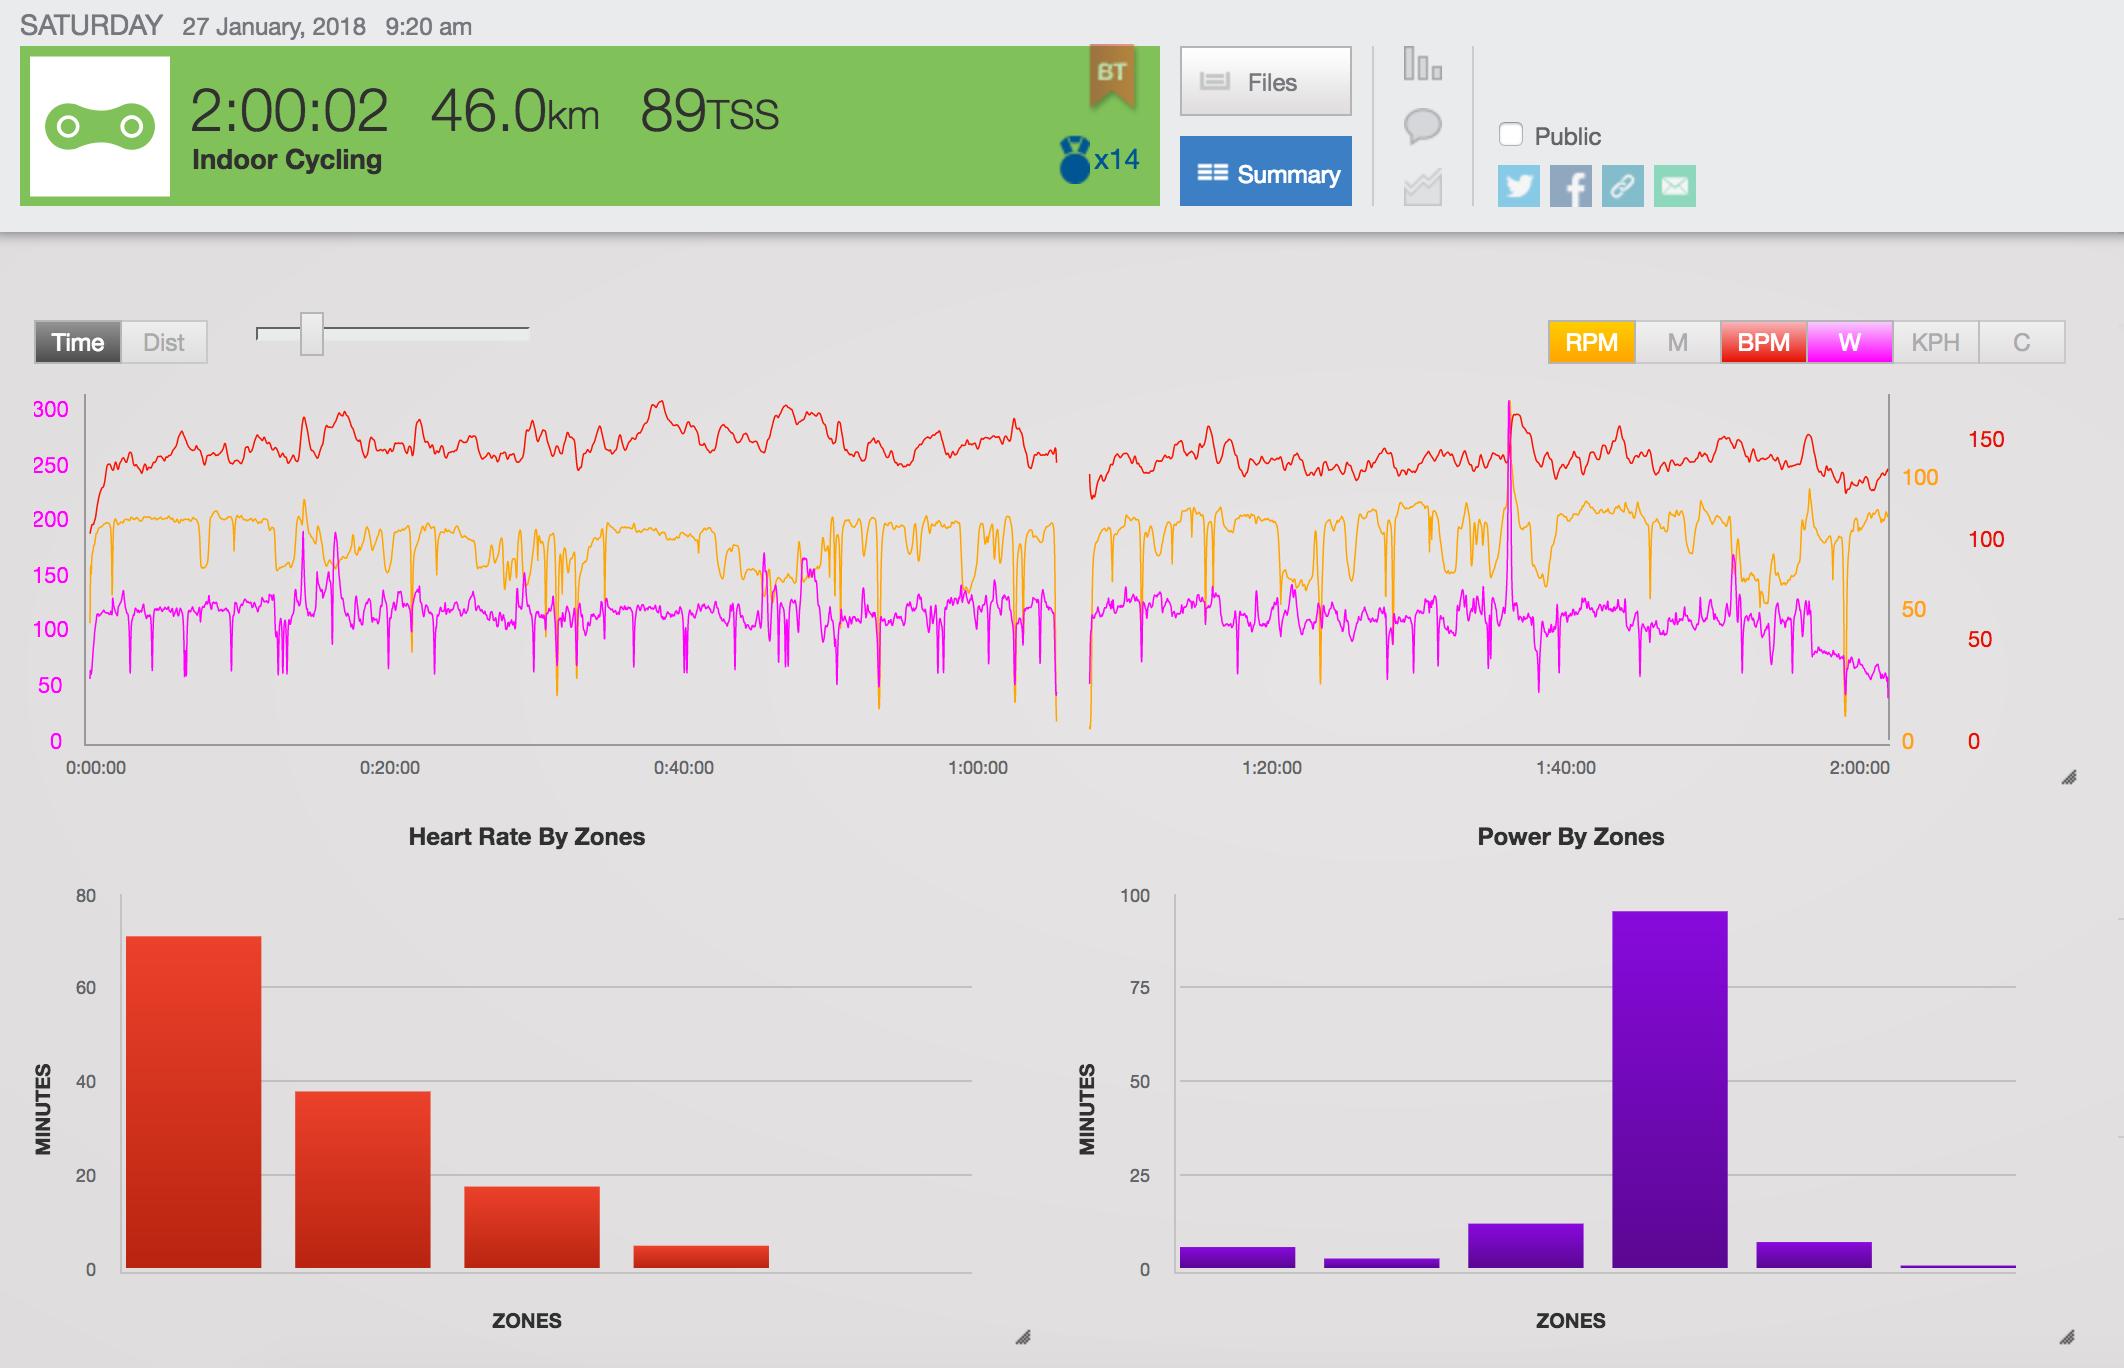 Trainingspeaks, Statistik, Values, Training, Cycling, Rennradblog, Radblog, Trainingsanalyse, PTS-Training